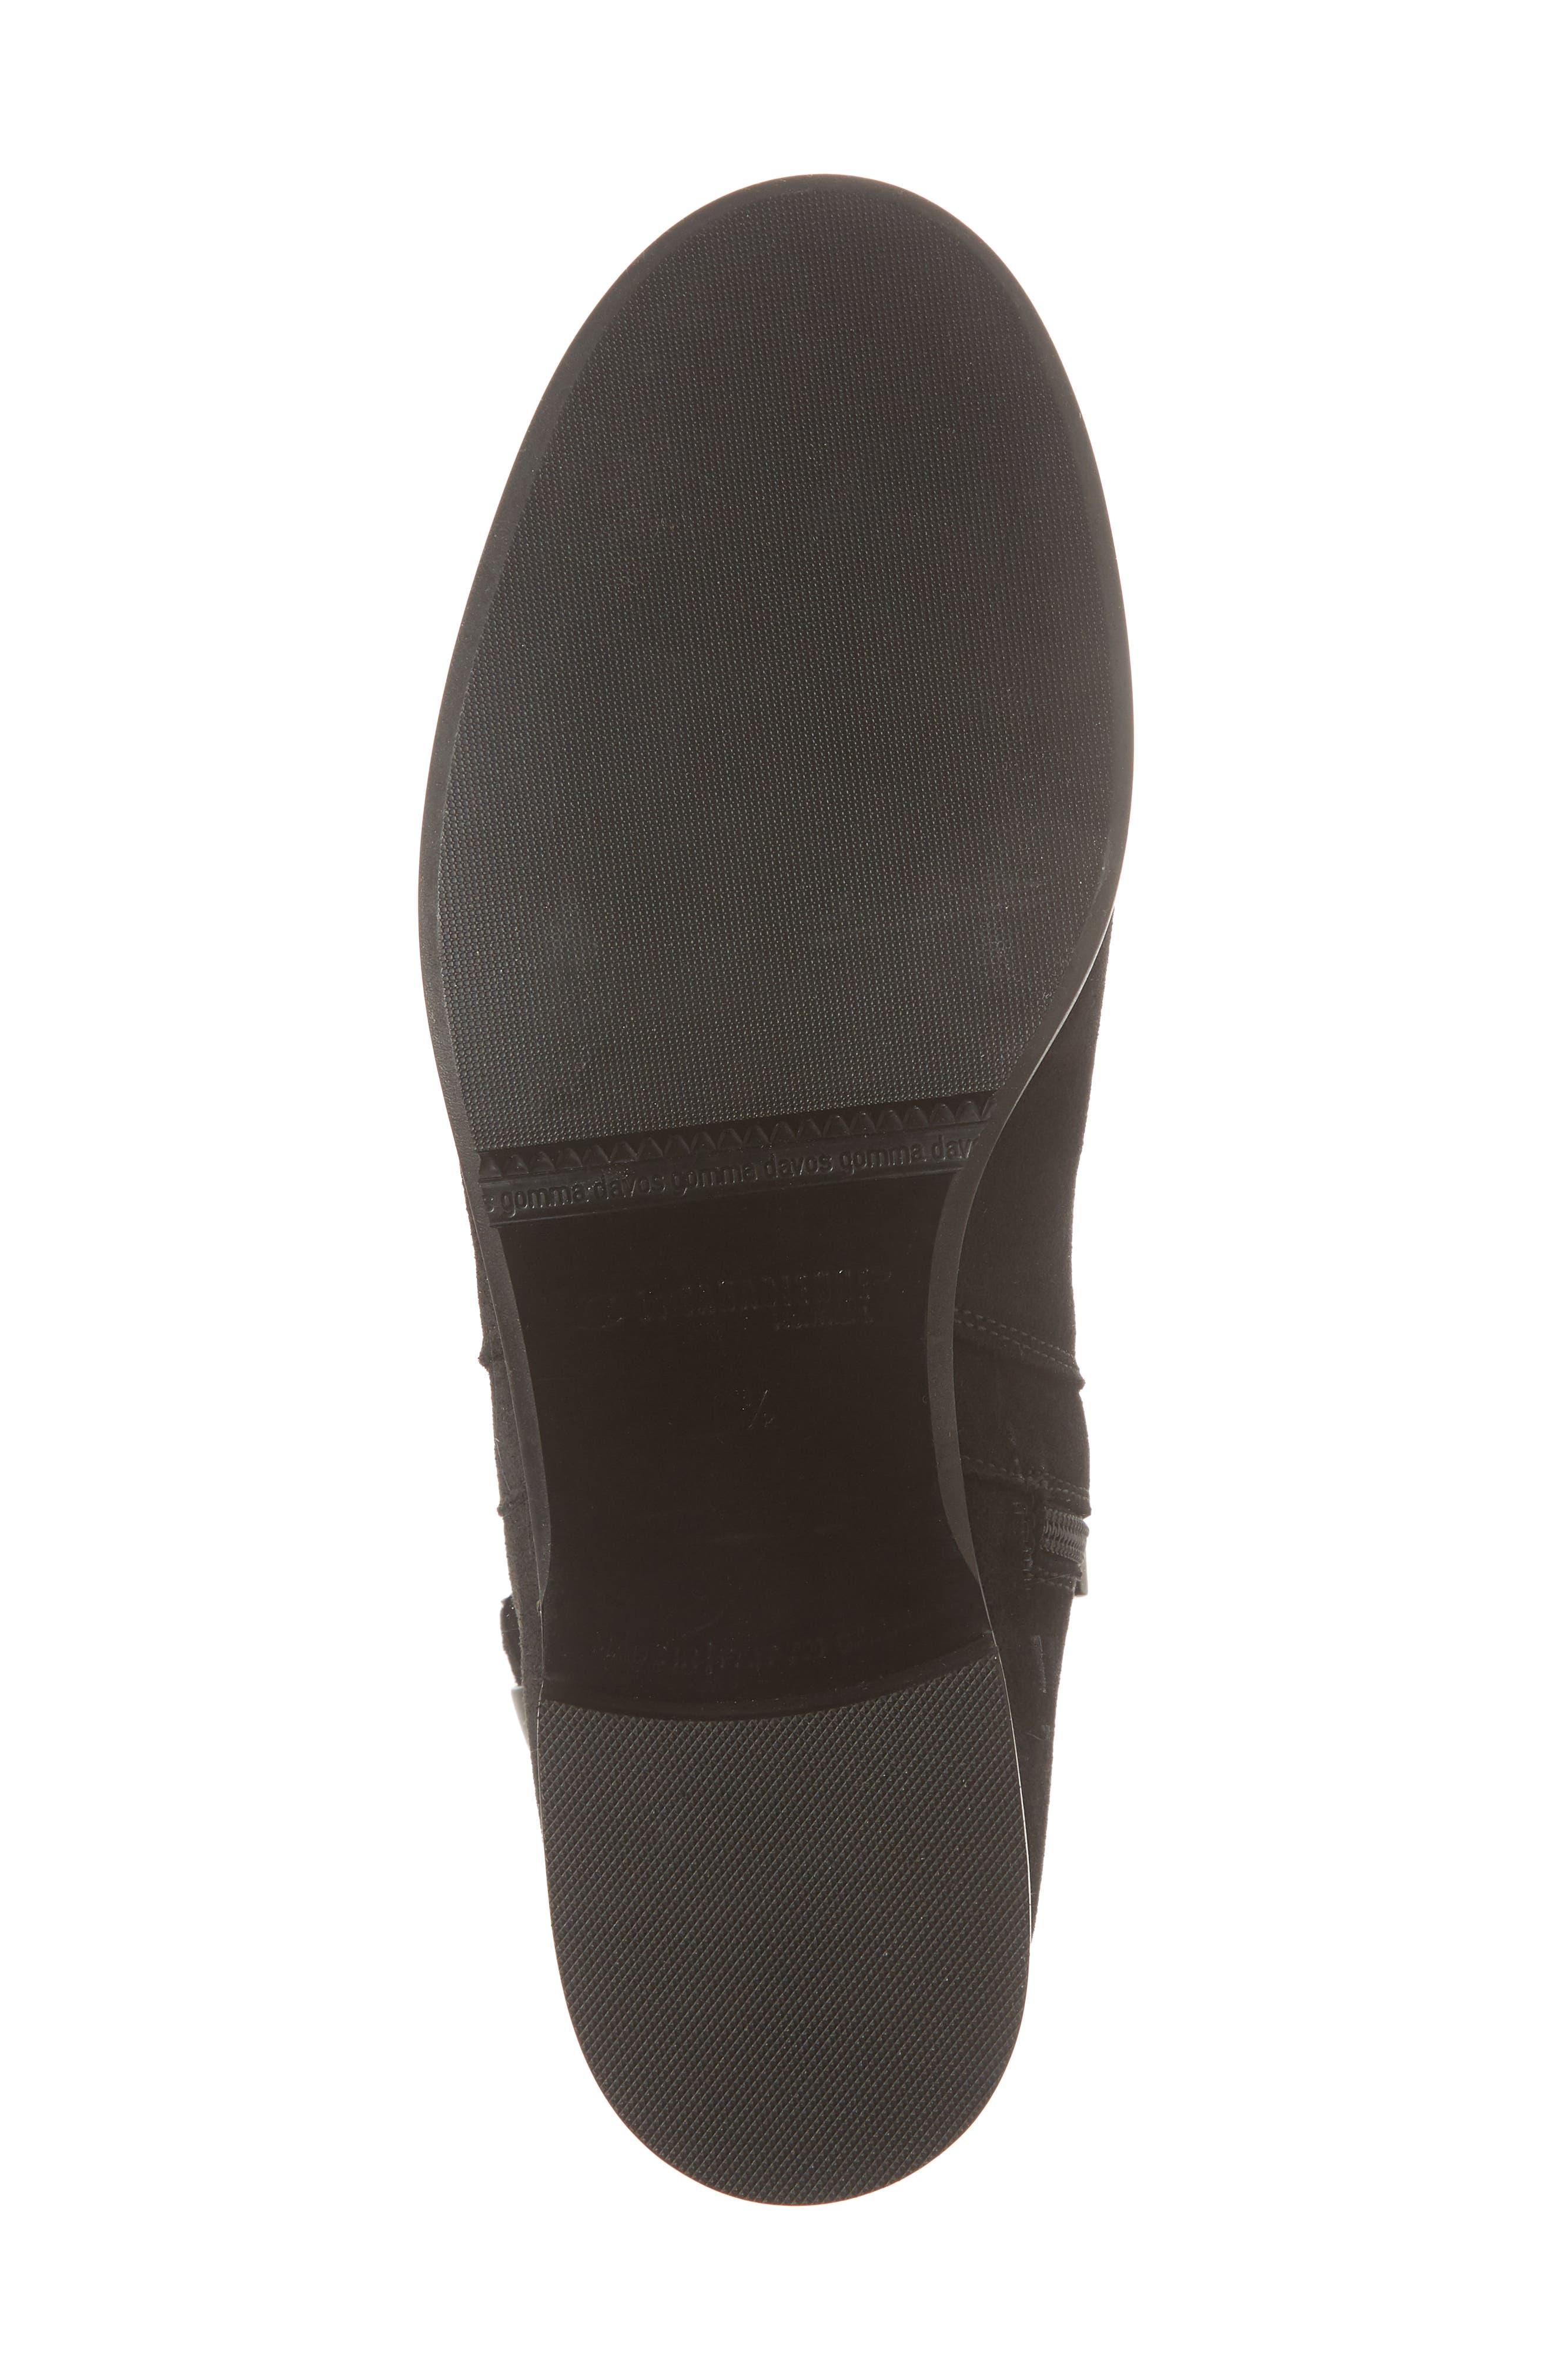 Sicilia Waterproof Boot,                             Alternate thumbnail 6, color,                             Black Suede